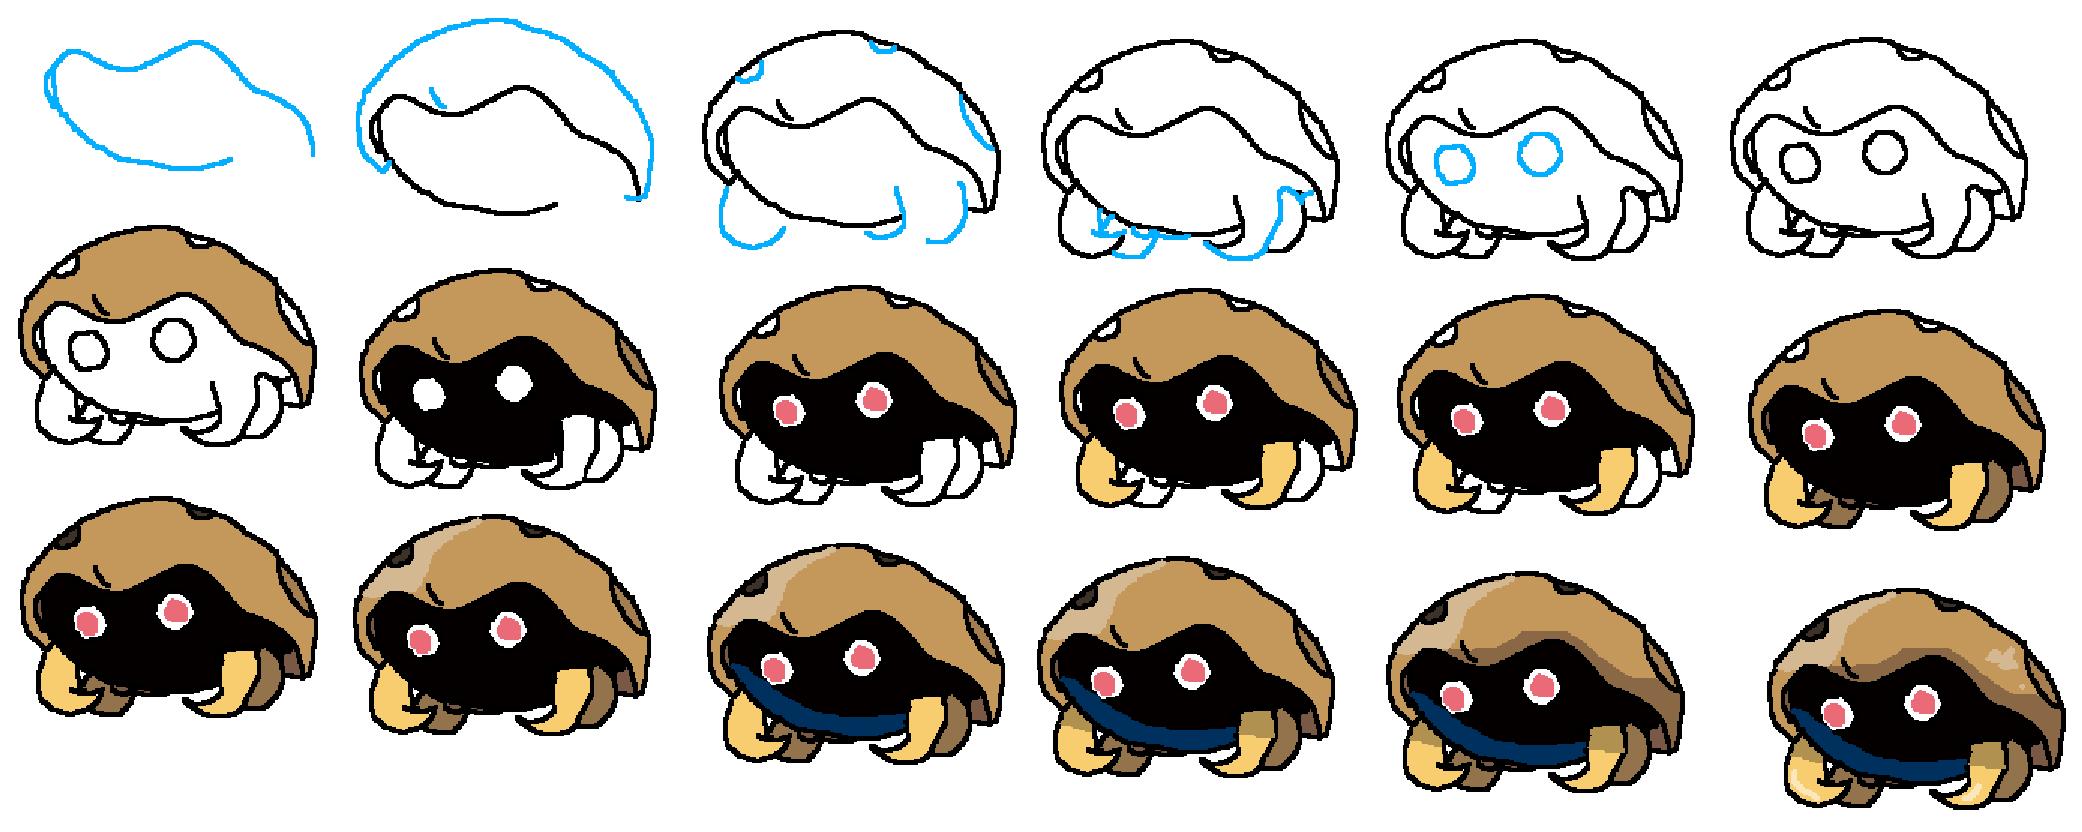 how to draw kabuto